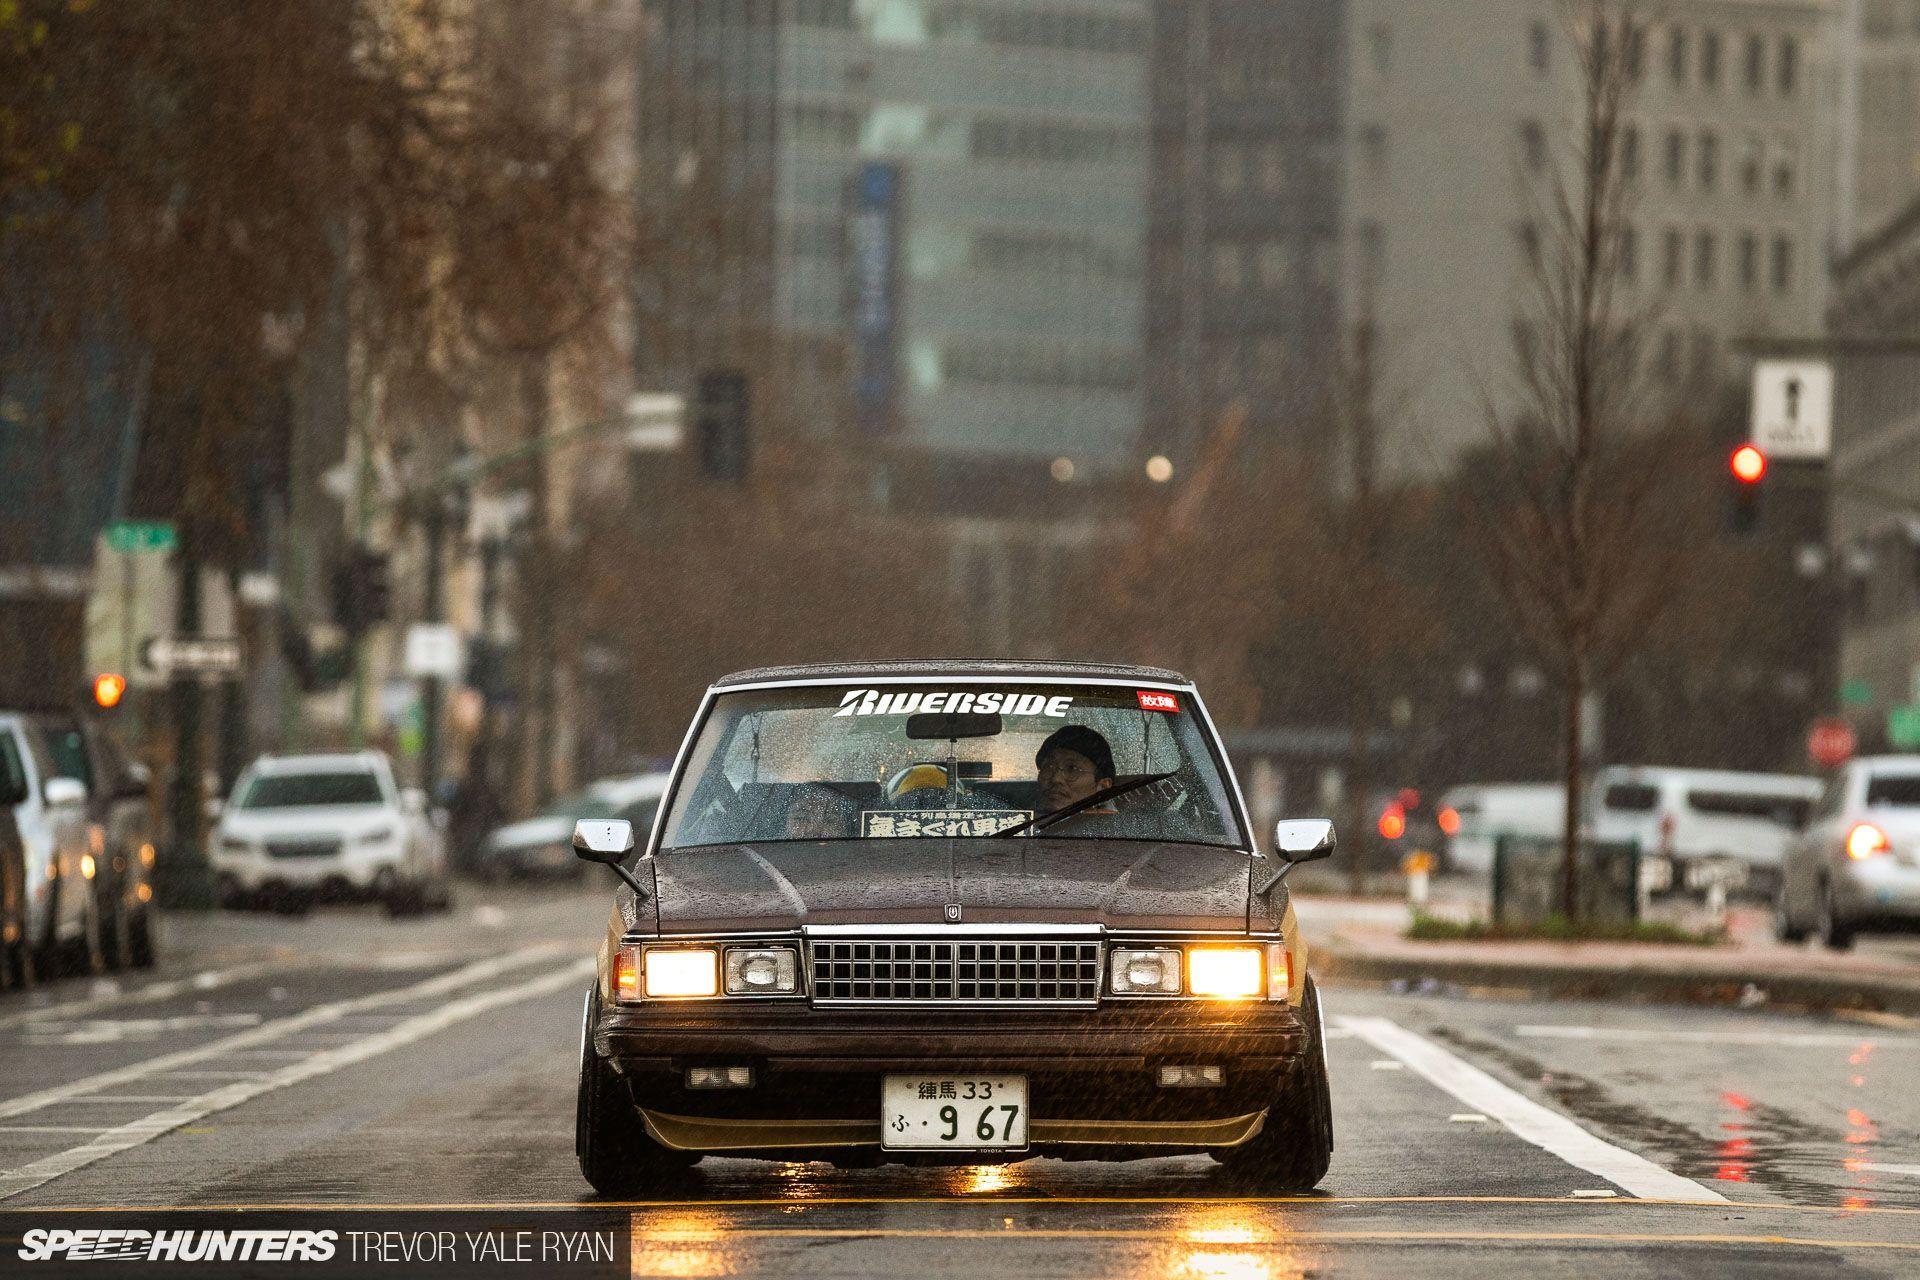 oakland built kaido inspired a californian cressida speedhunters ae86 toyota cressida subaru gt pinterest